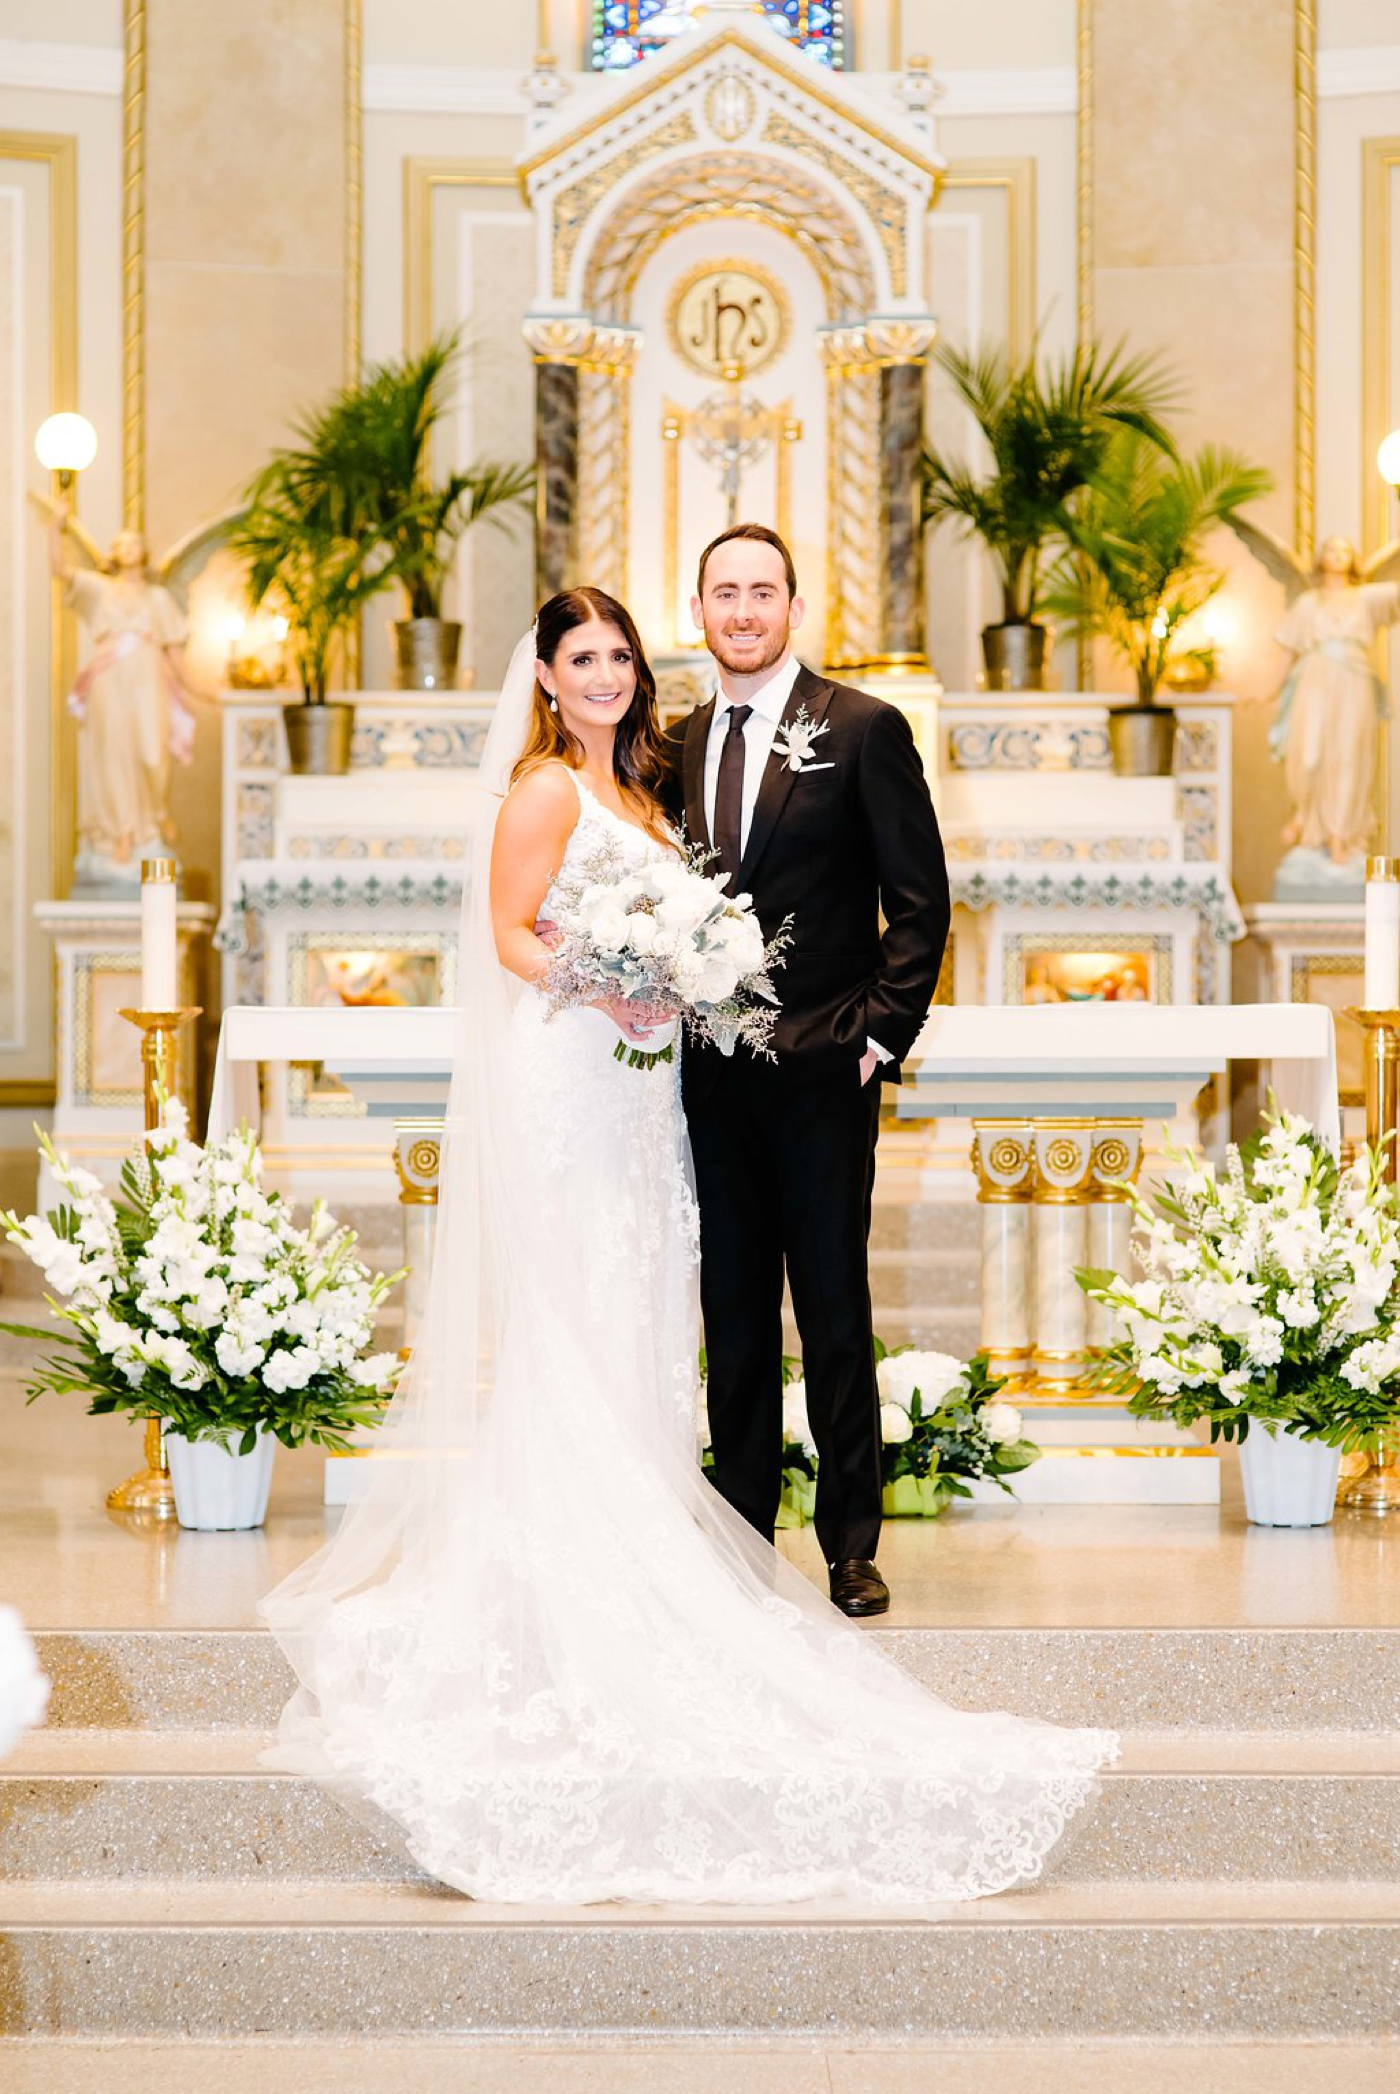 chicago-fine-art-wedding-photography-duncan45